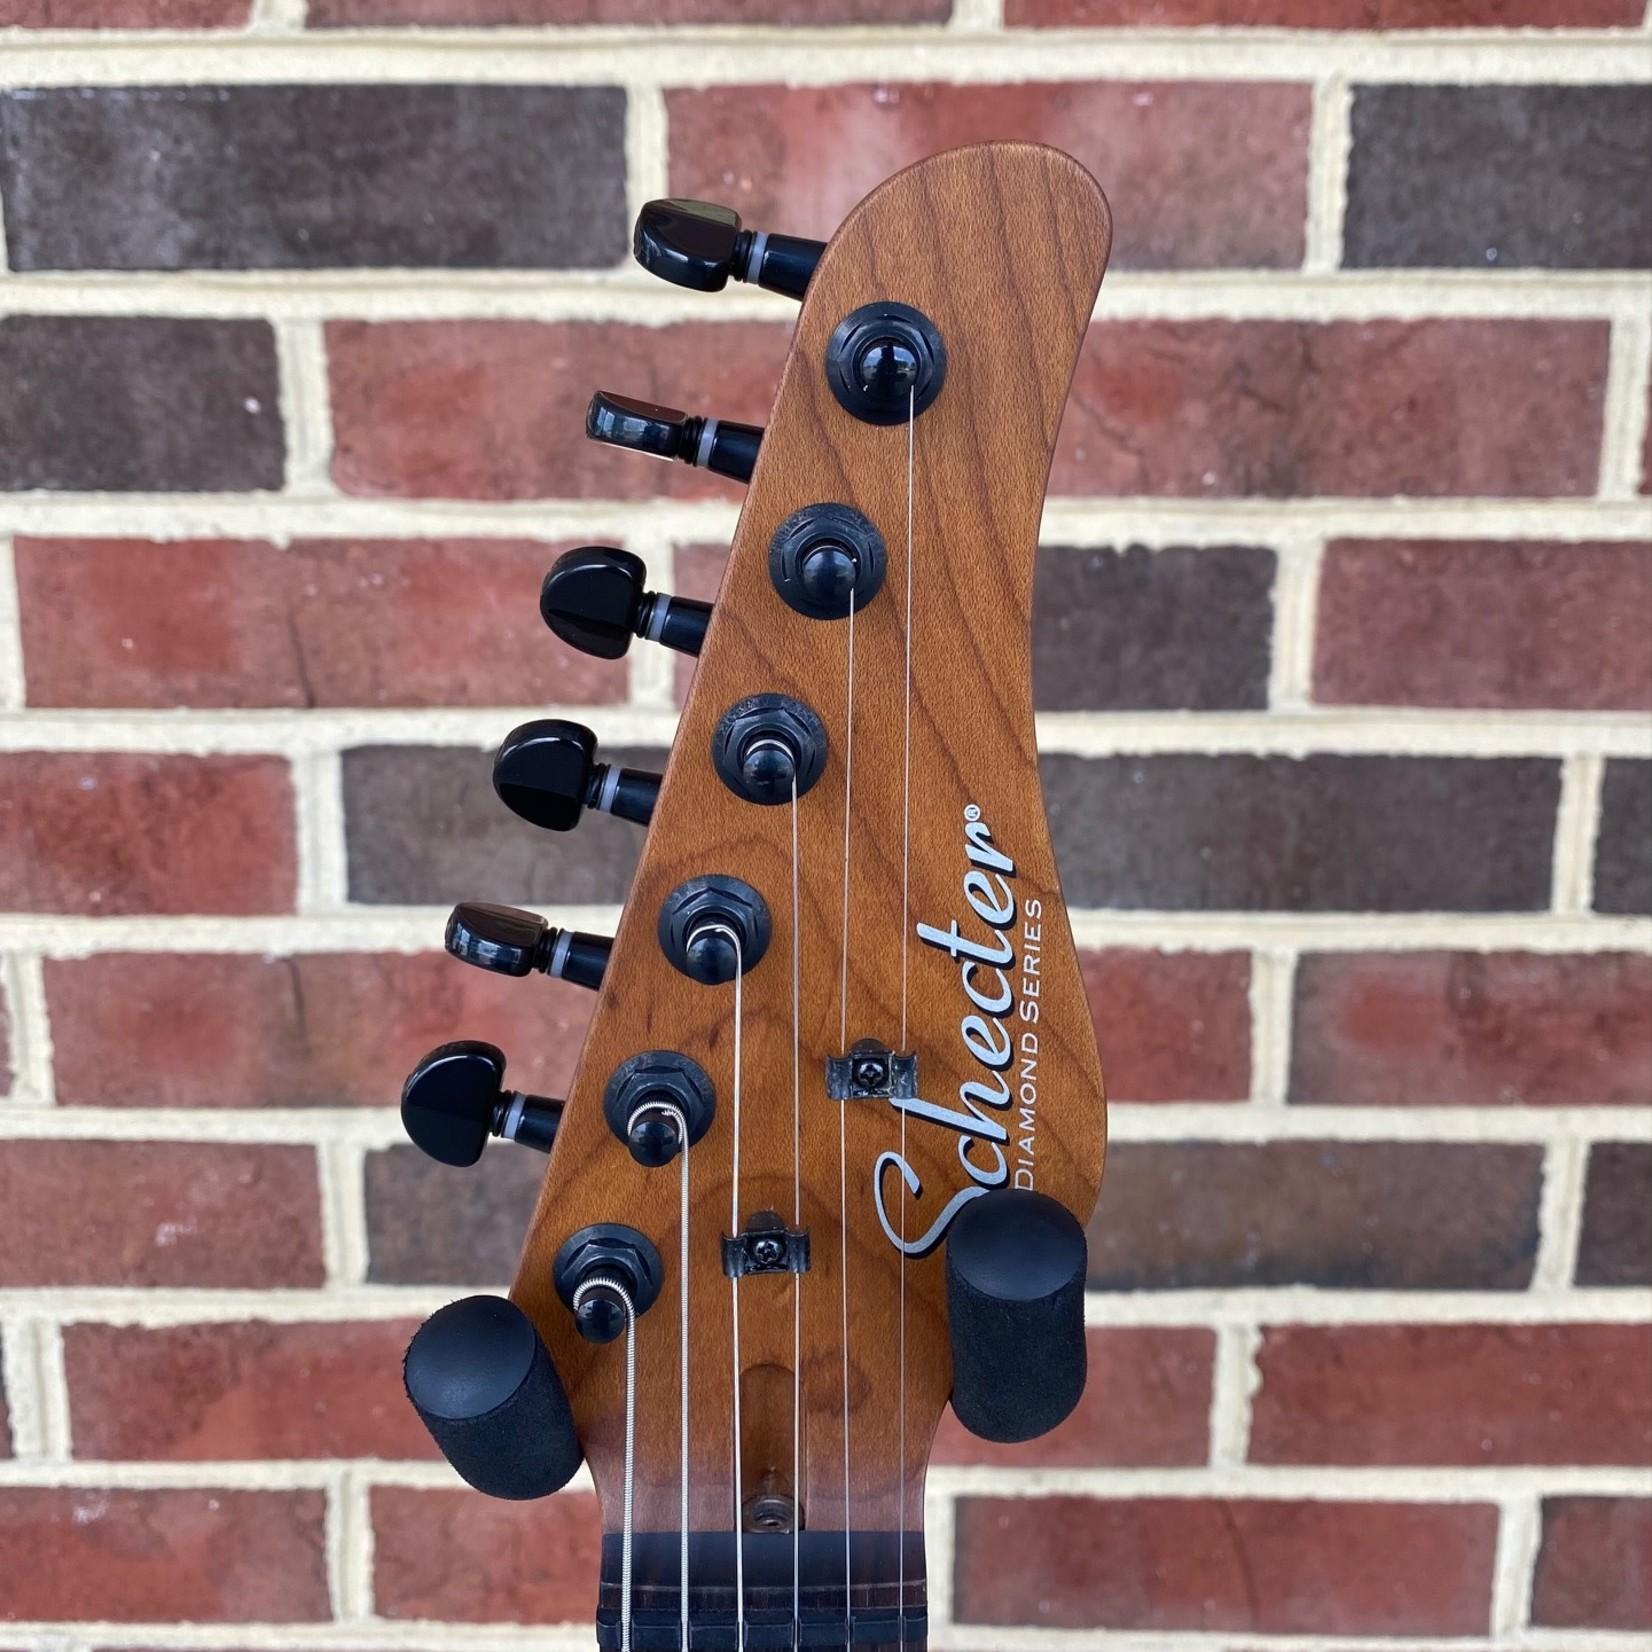 Schecter Guitar Research Schecter PT Pro, Trans Purple Burst, Roasted Maple Neck, Ebony Fretboard, Locking Tuners